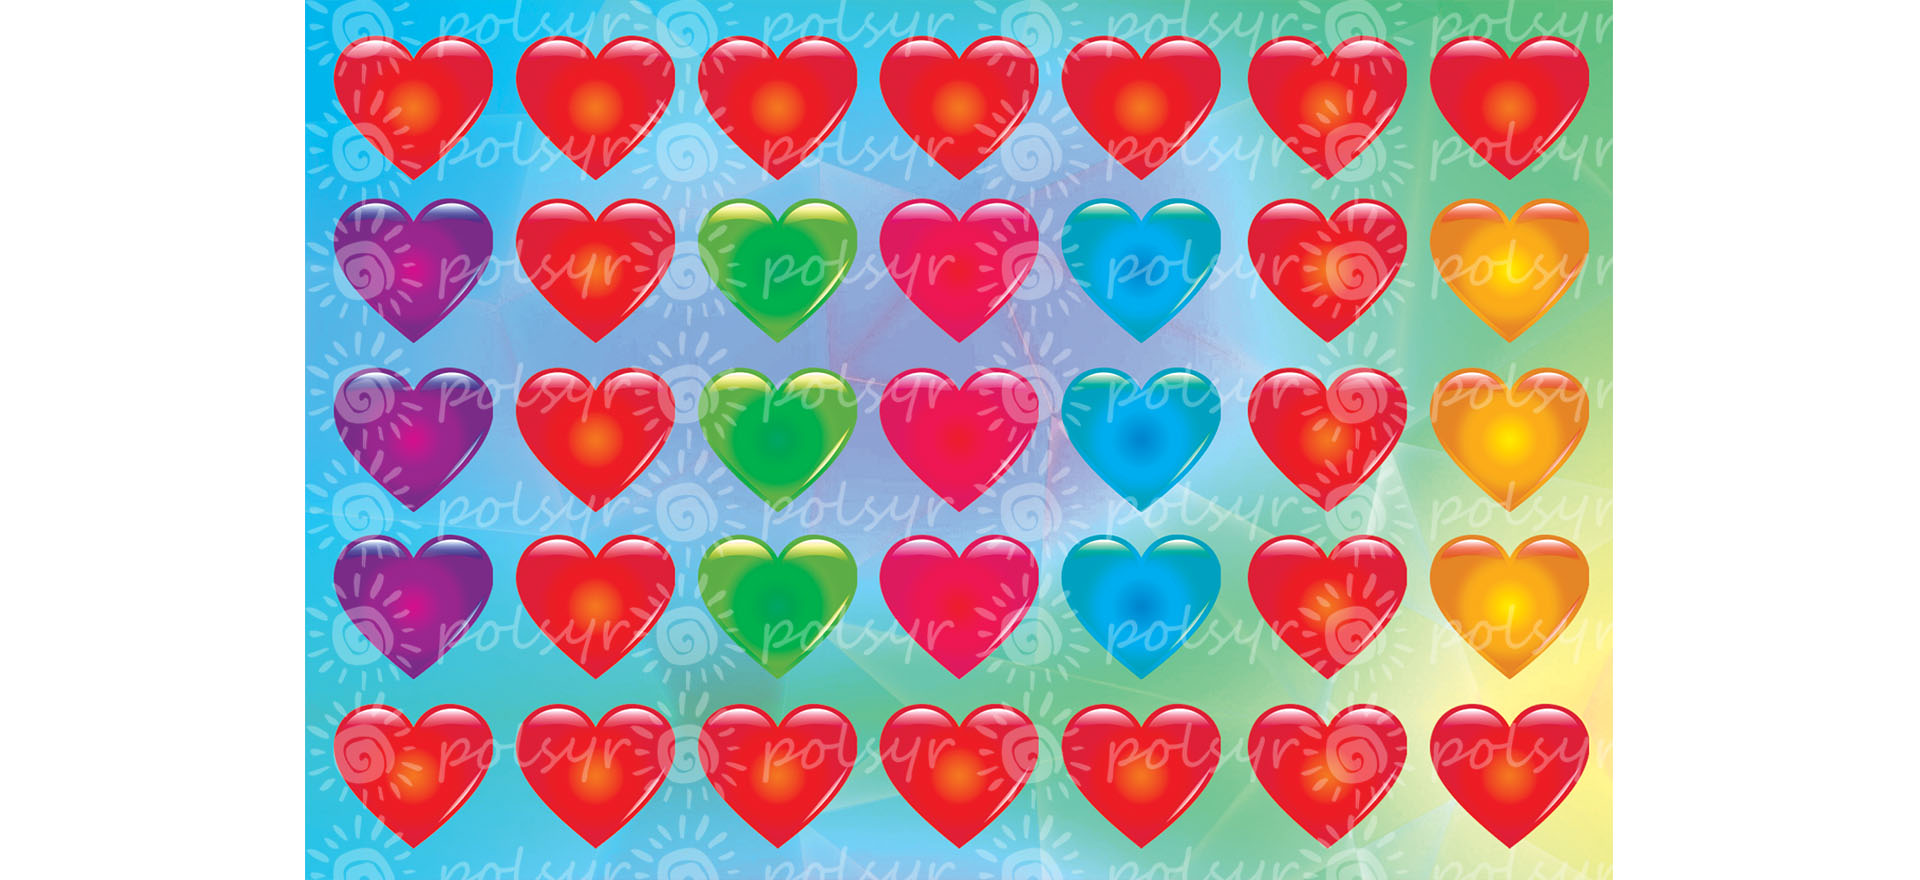 naklejki-serca-male-polsyr-1